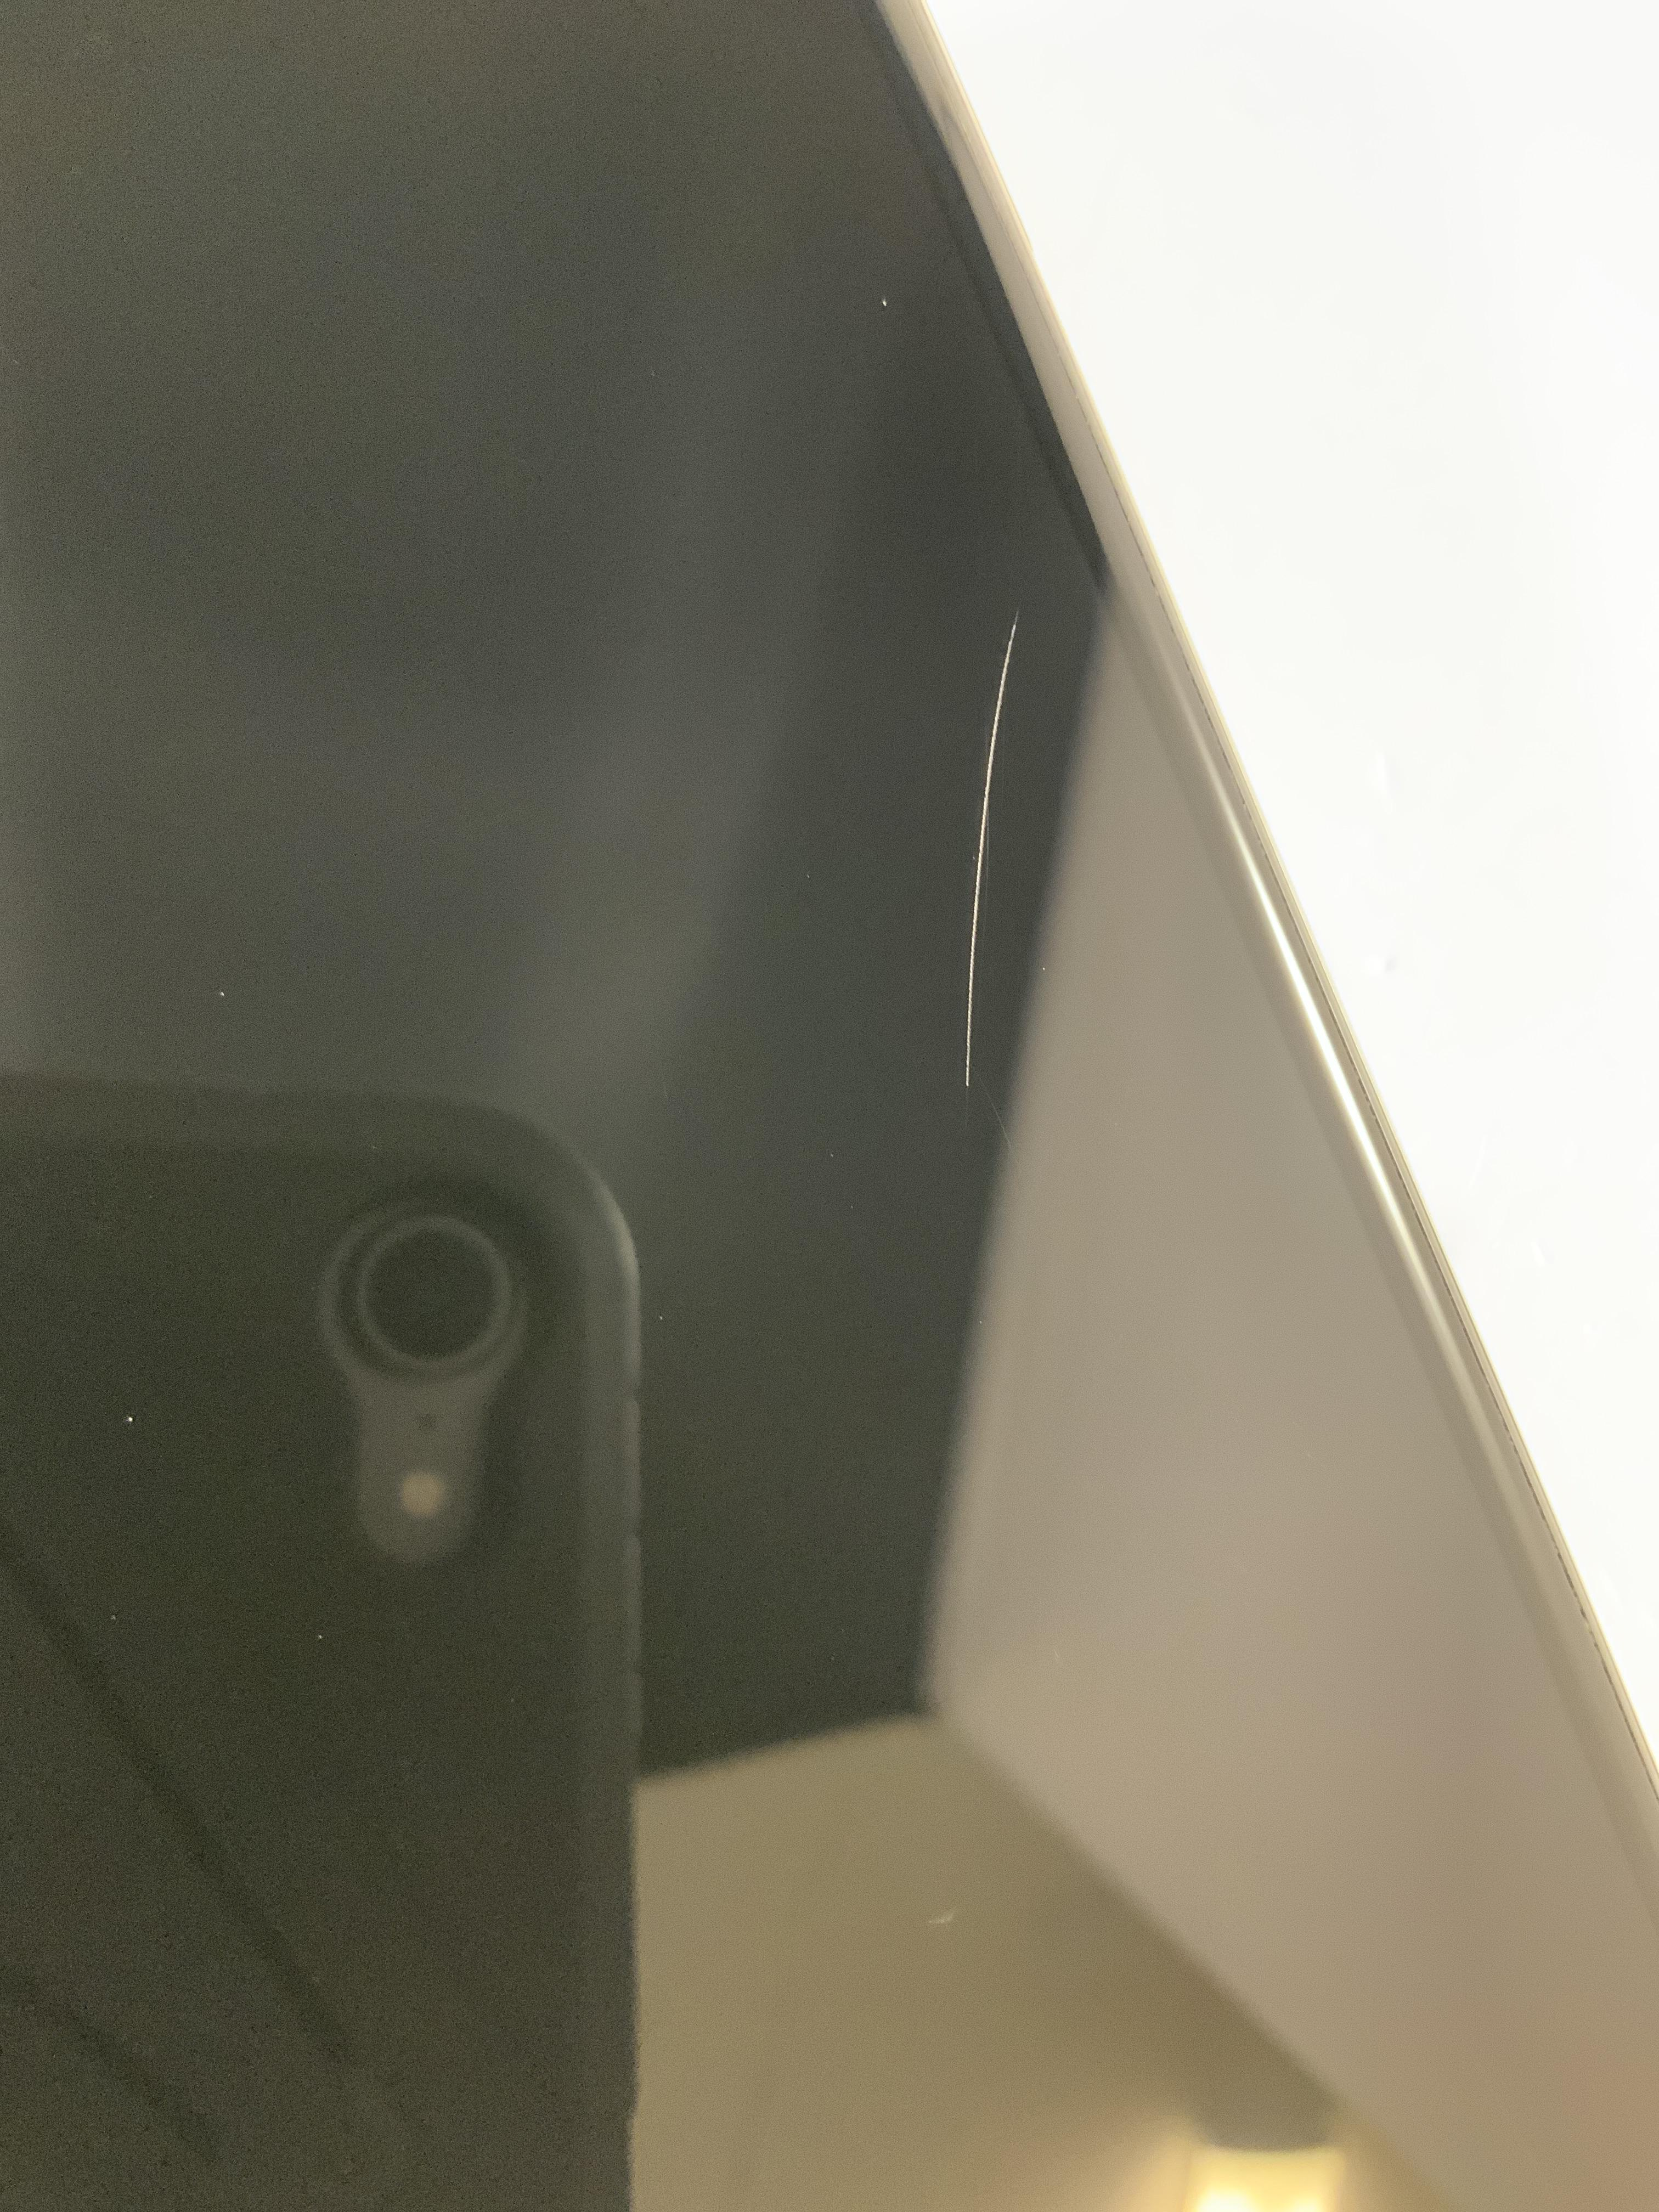 iPhone 11 Pro Max 256GB, 256GB, Space Gray, Bild 3